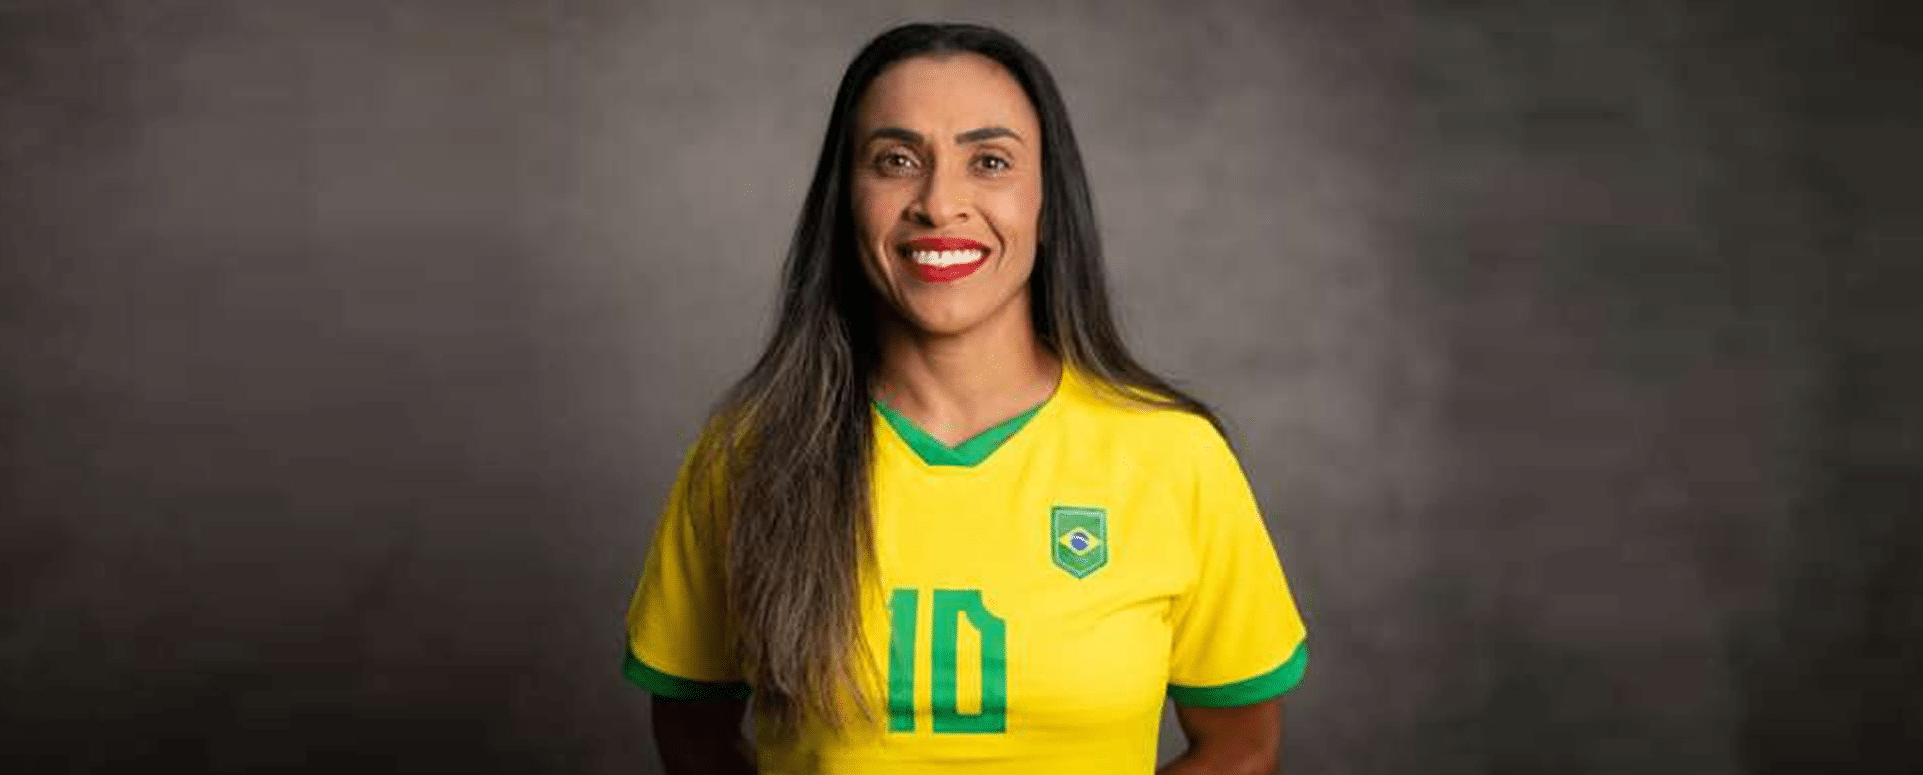 Marta Nike Jogos Olímpicos